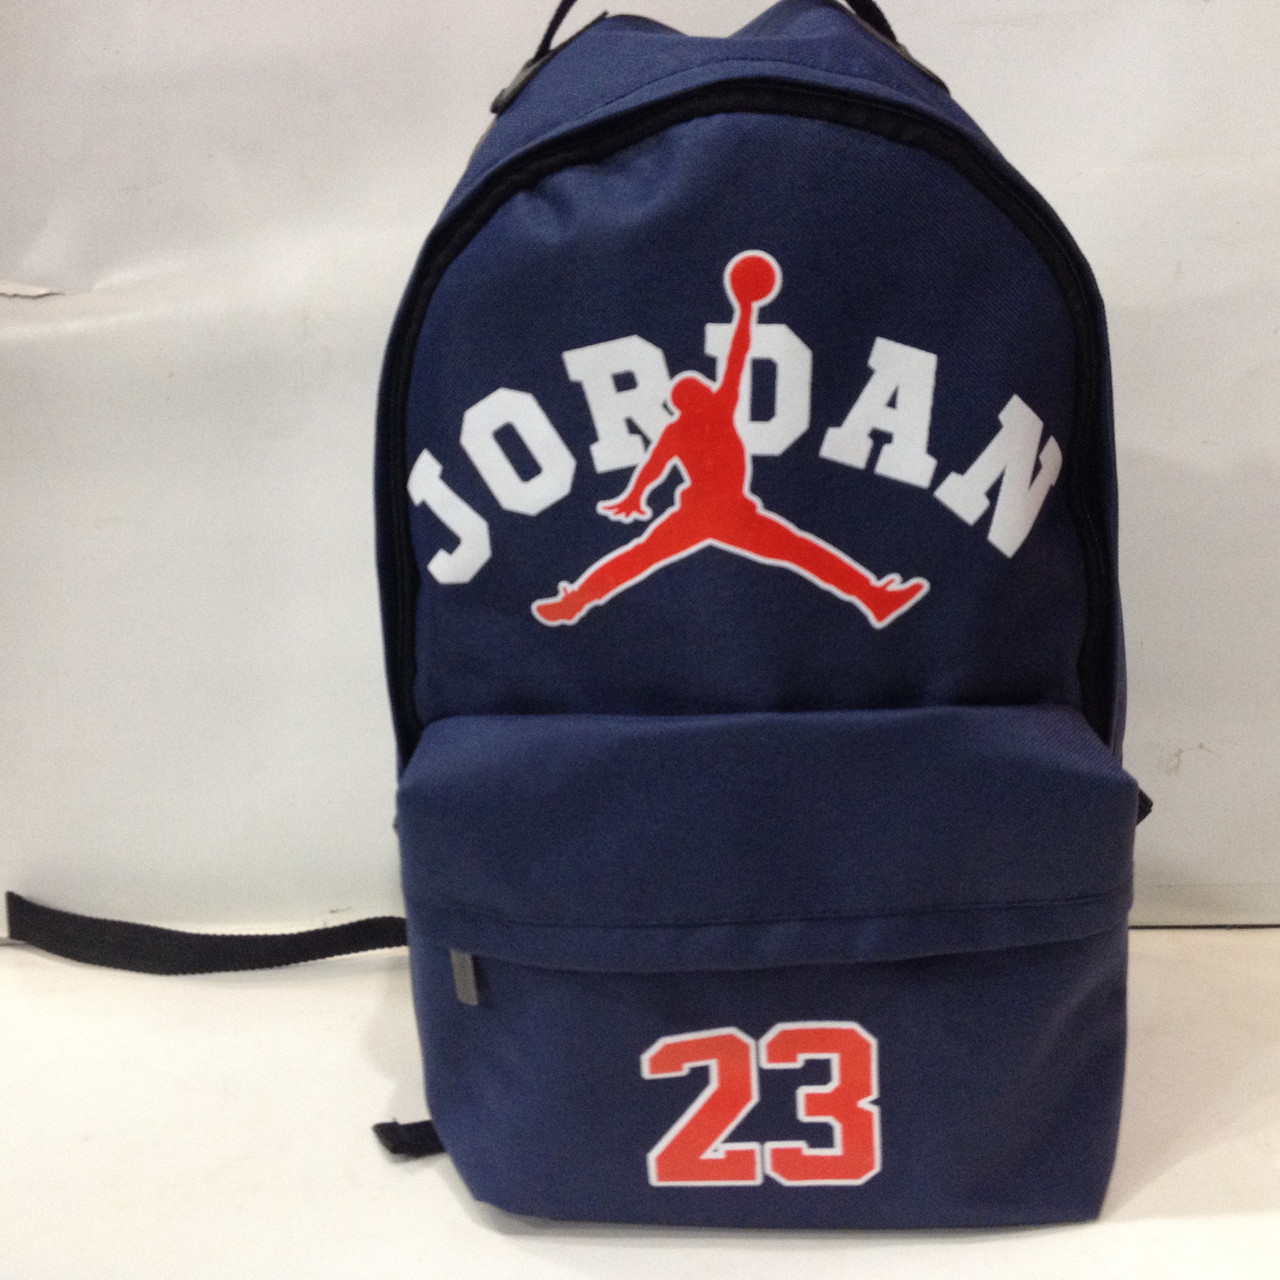 Air jordan 23 рюкзак рюкзак-кенгуру бимбо описание